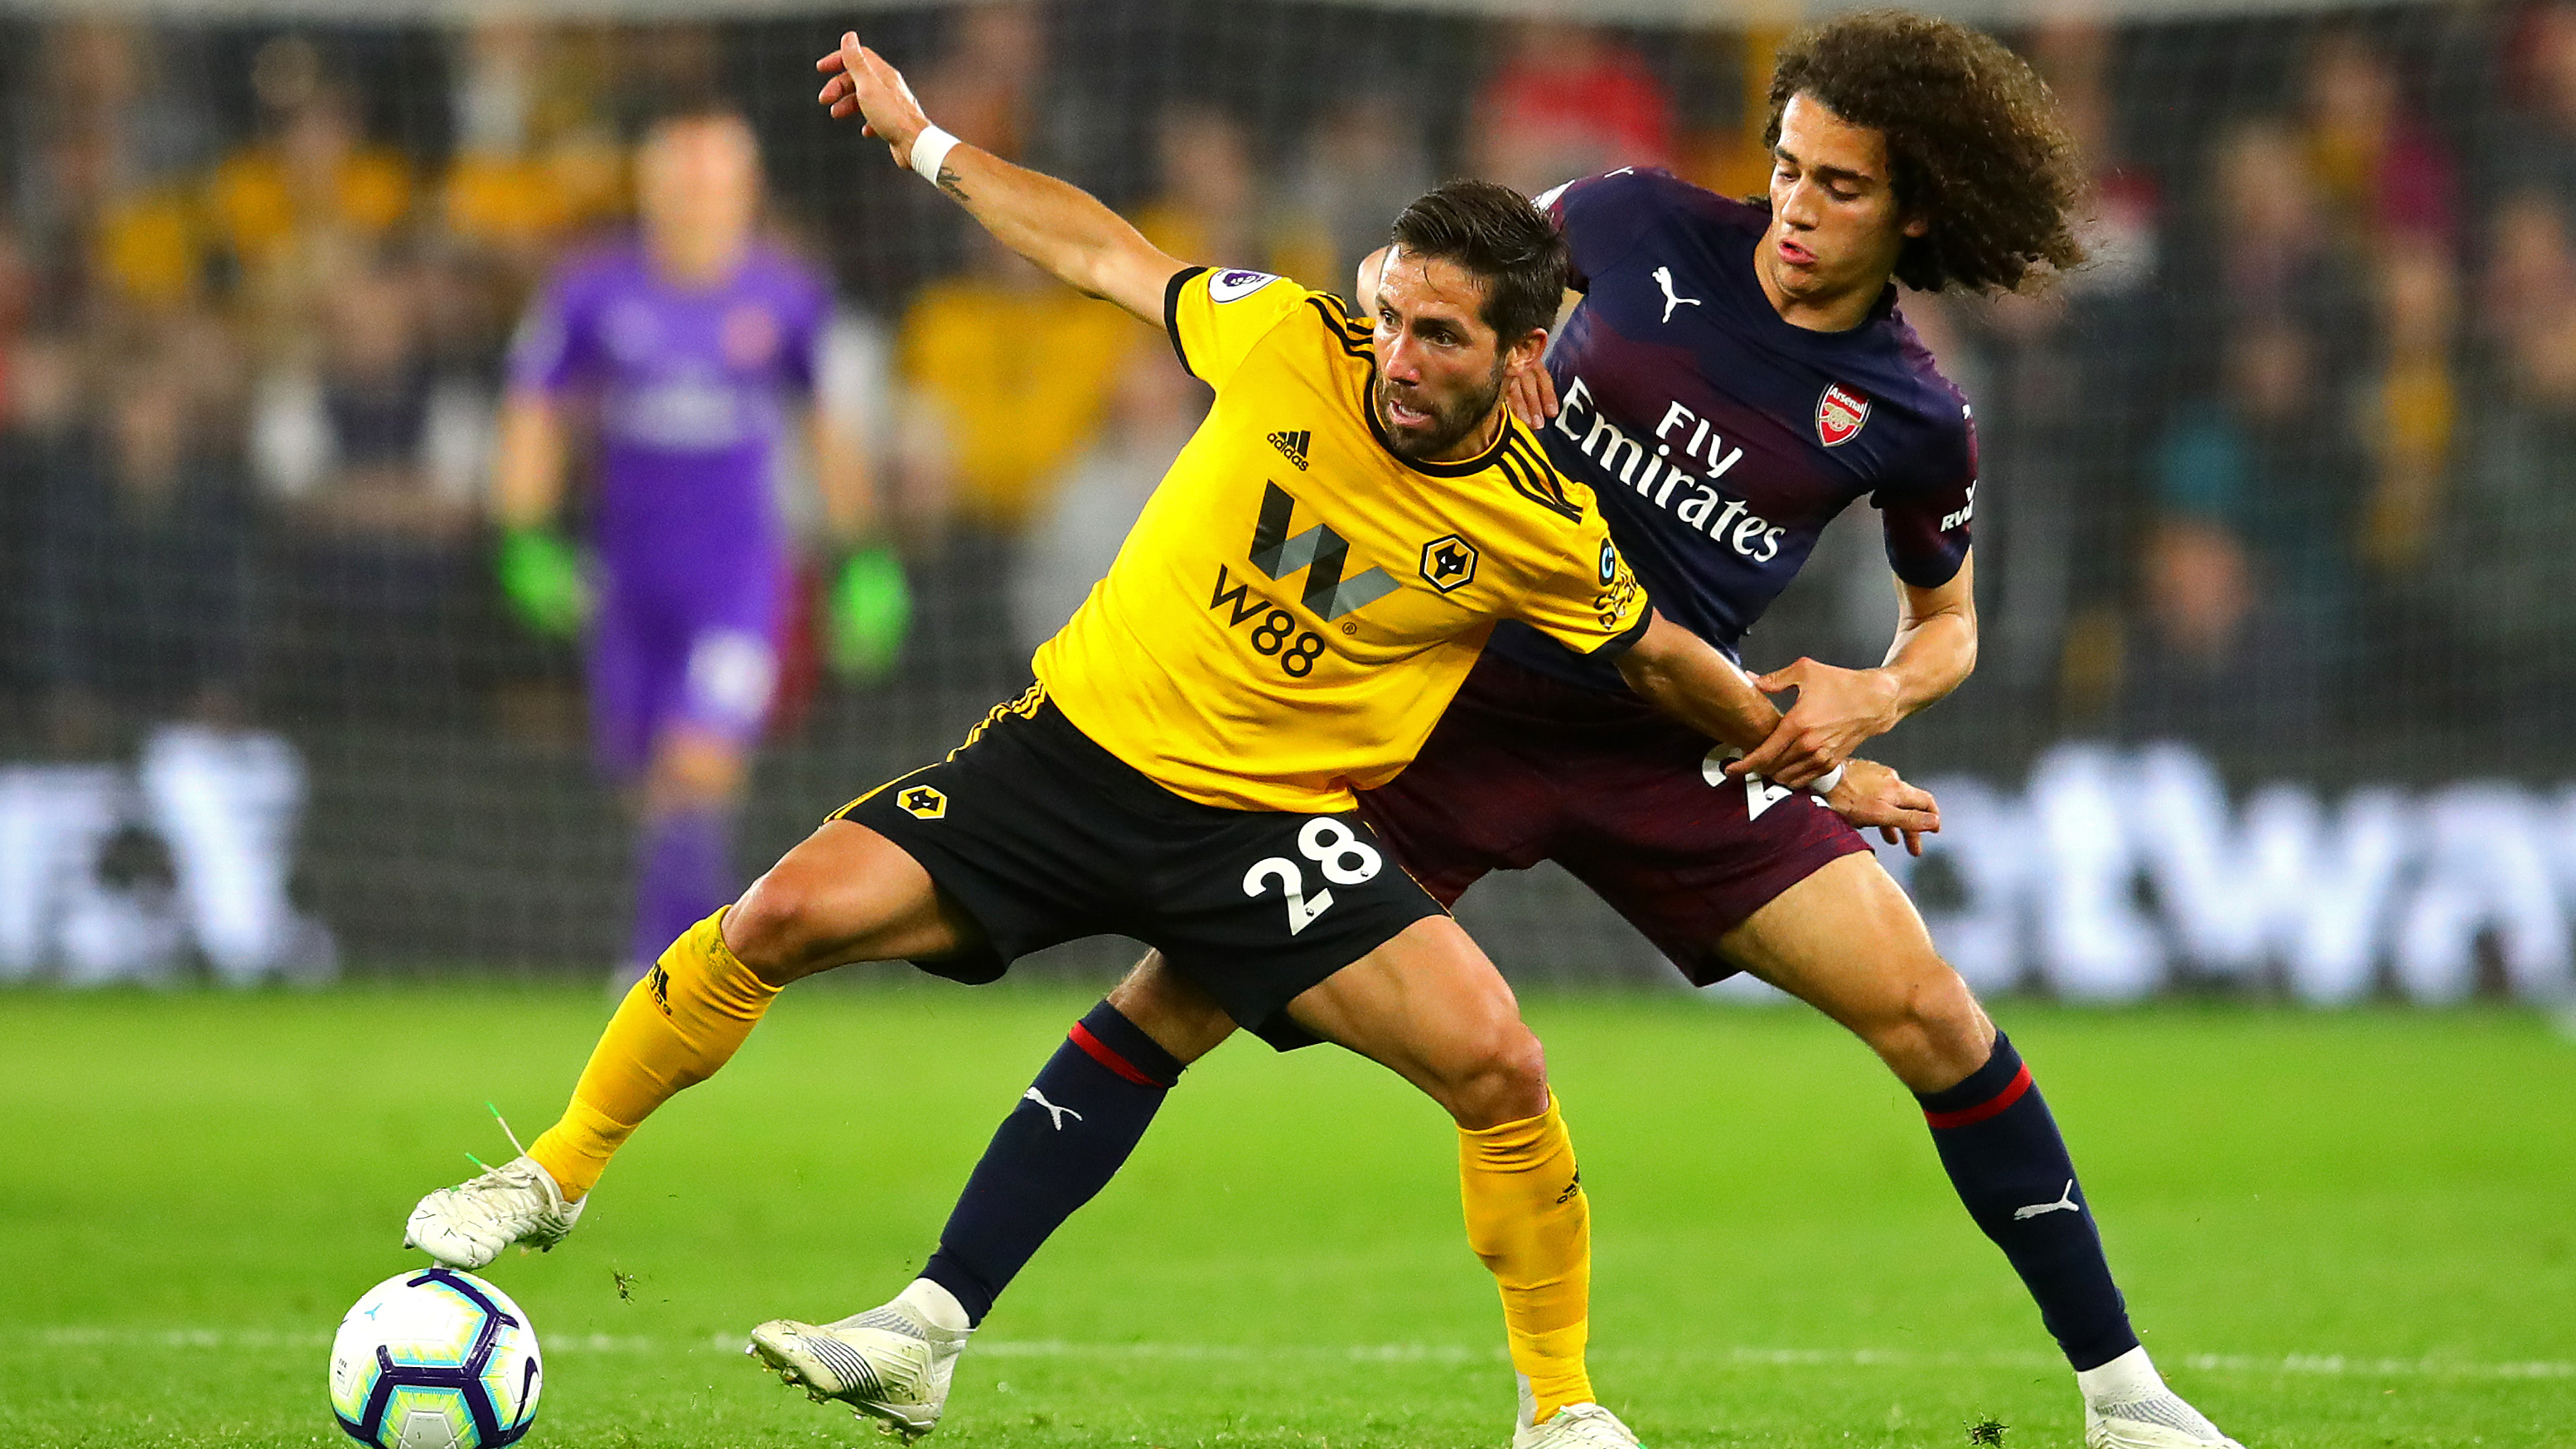 Premier League TV, streaming schedule - ProSoccerTalk | NBC Sports